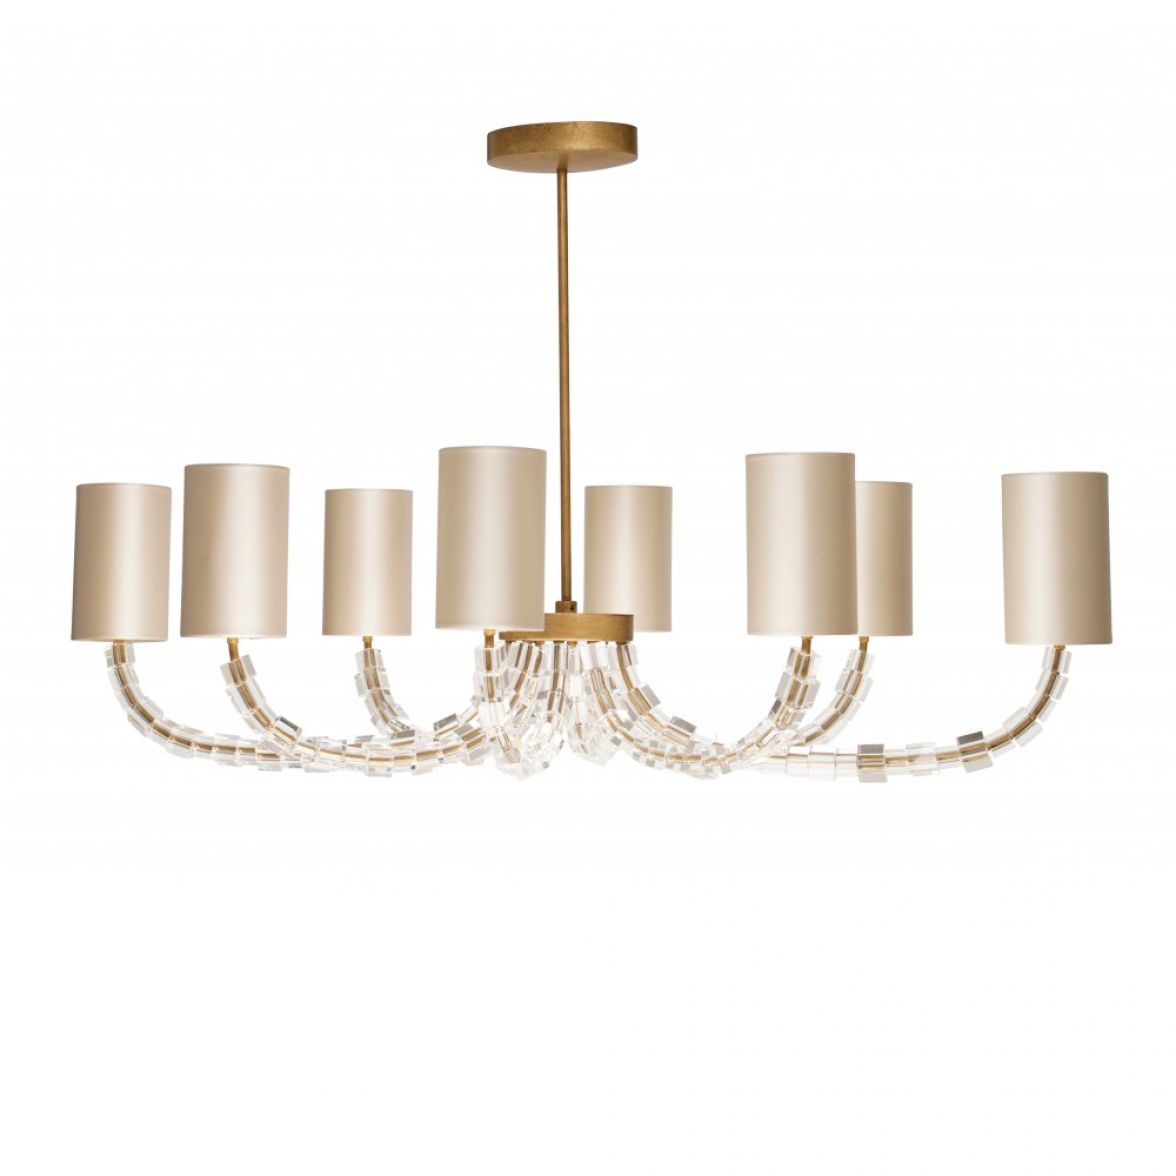 Oval Lartigue chandelier фото цена